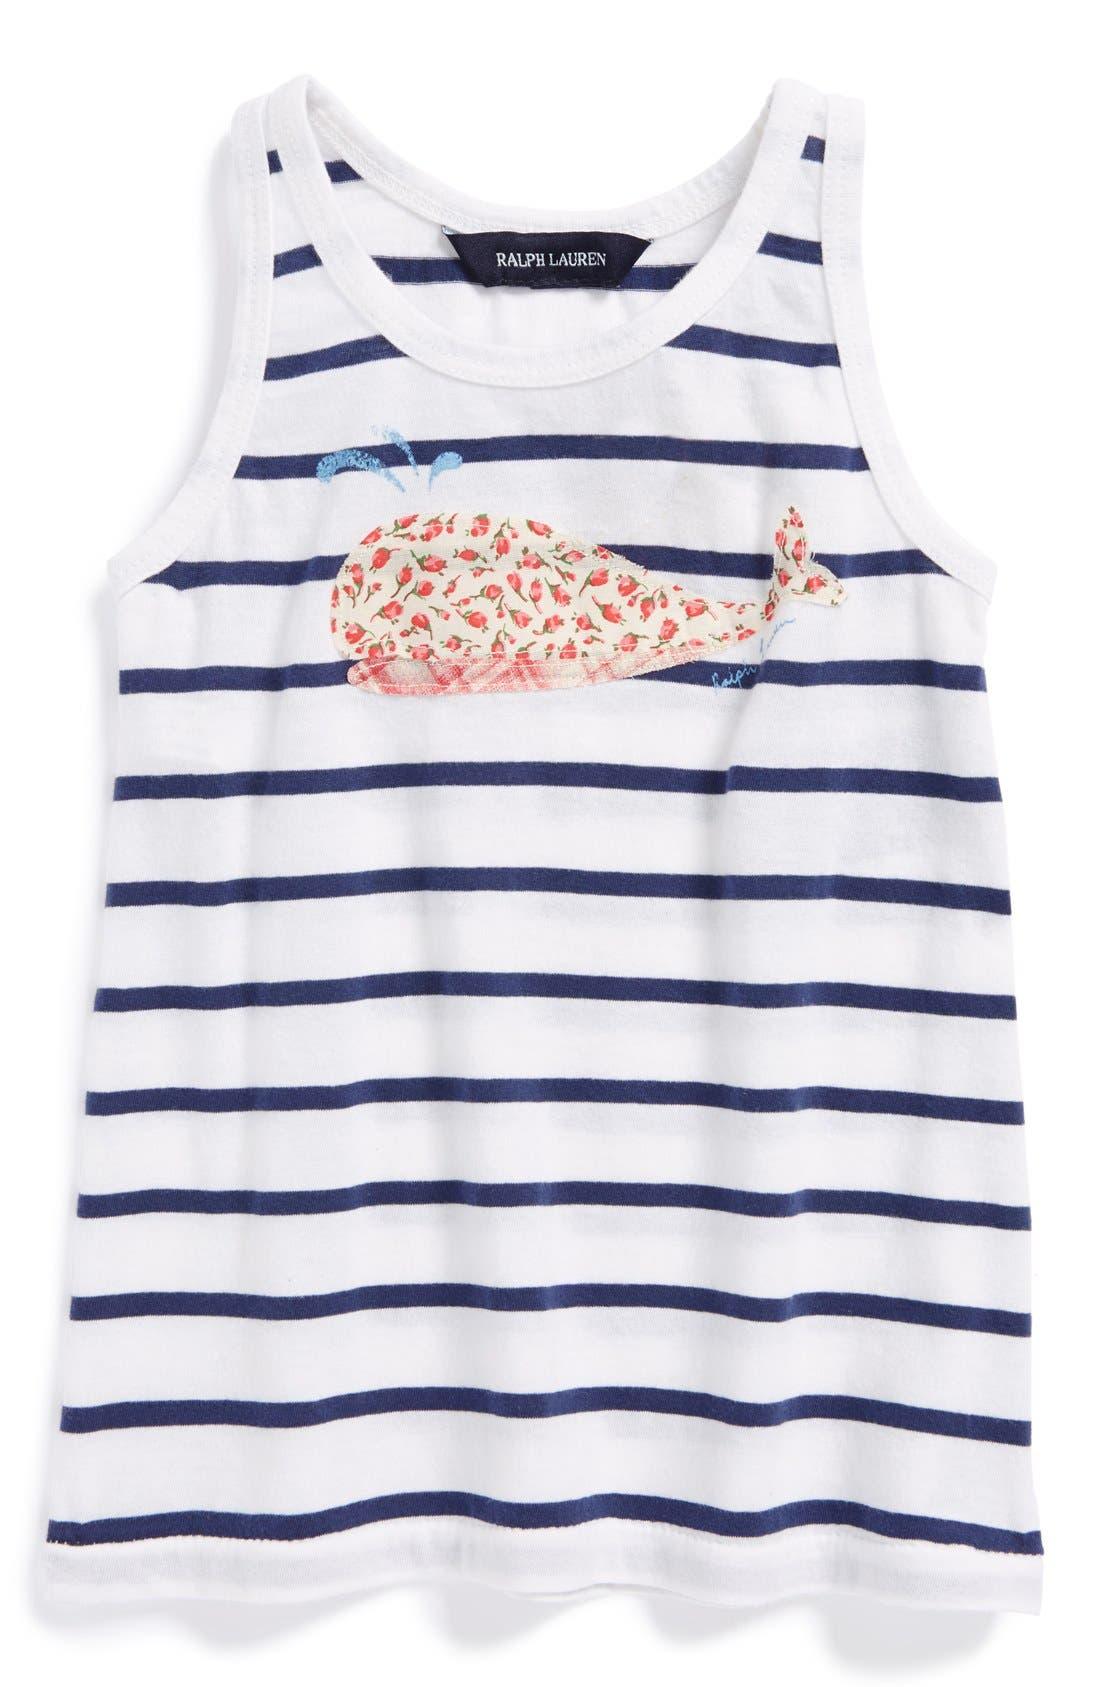 Main Image - Ralph Lauren Appliqué Logo Jersey Tank Top (Toddler Girls)